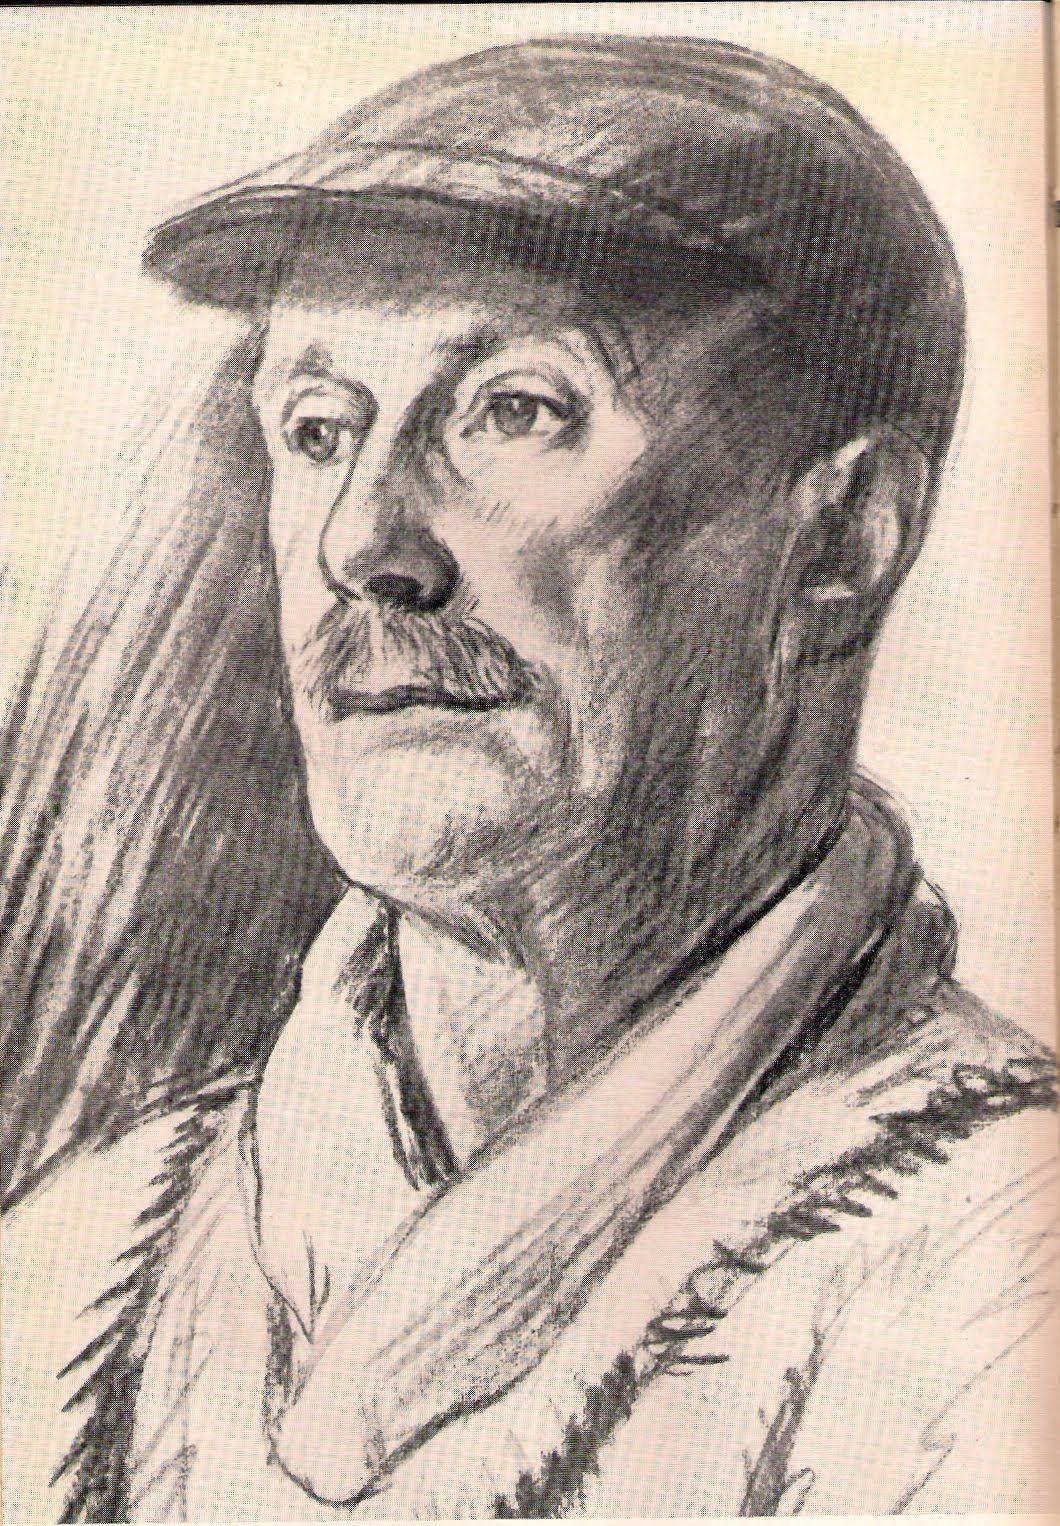 Thomas Eakins Portrait Drawing